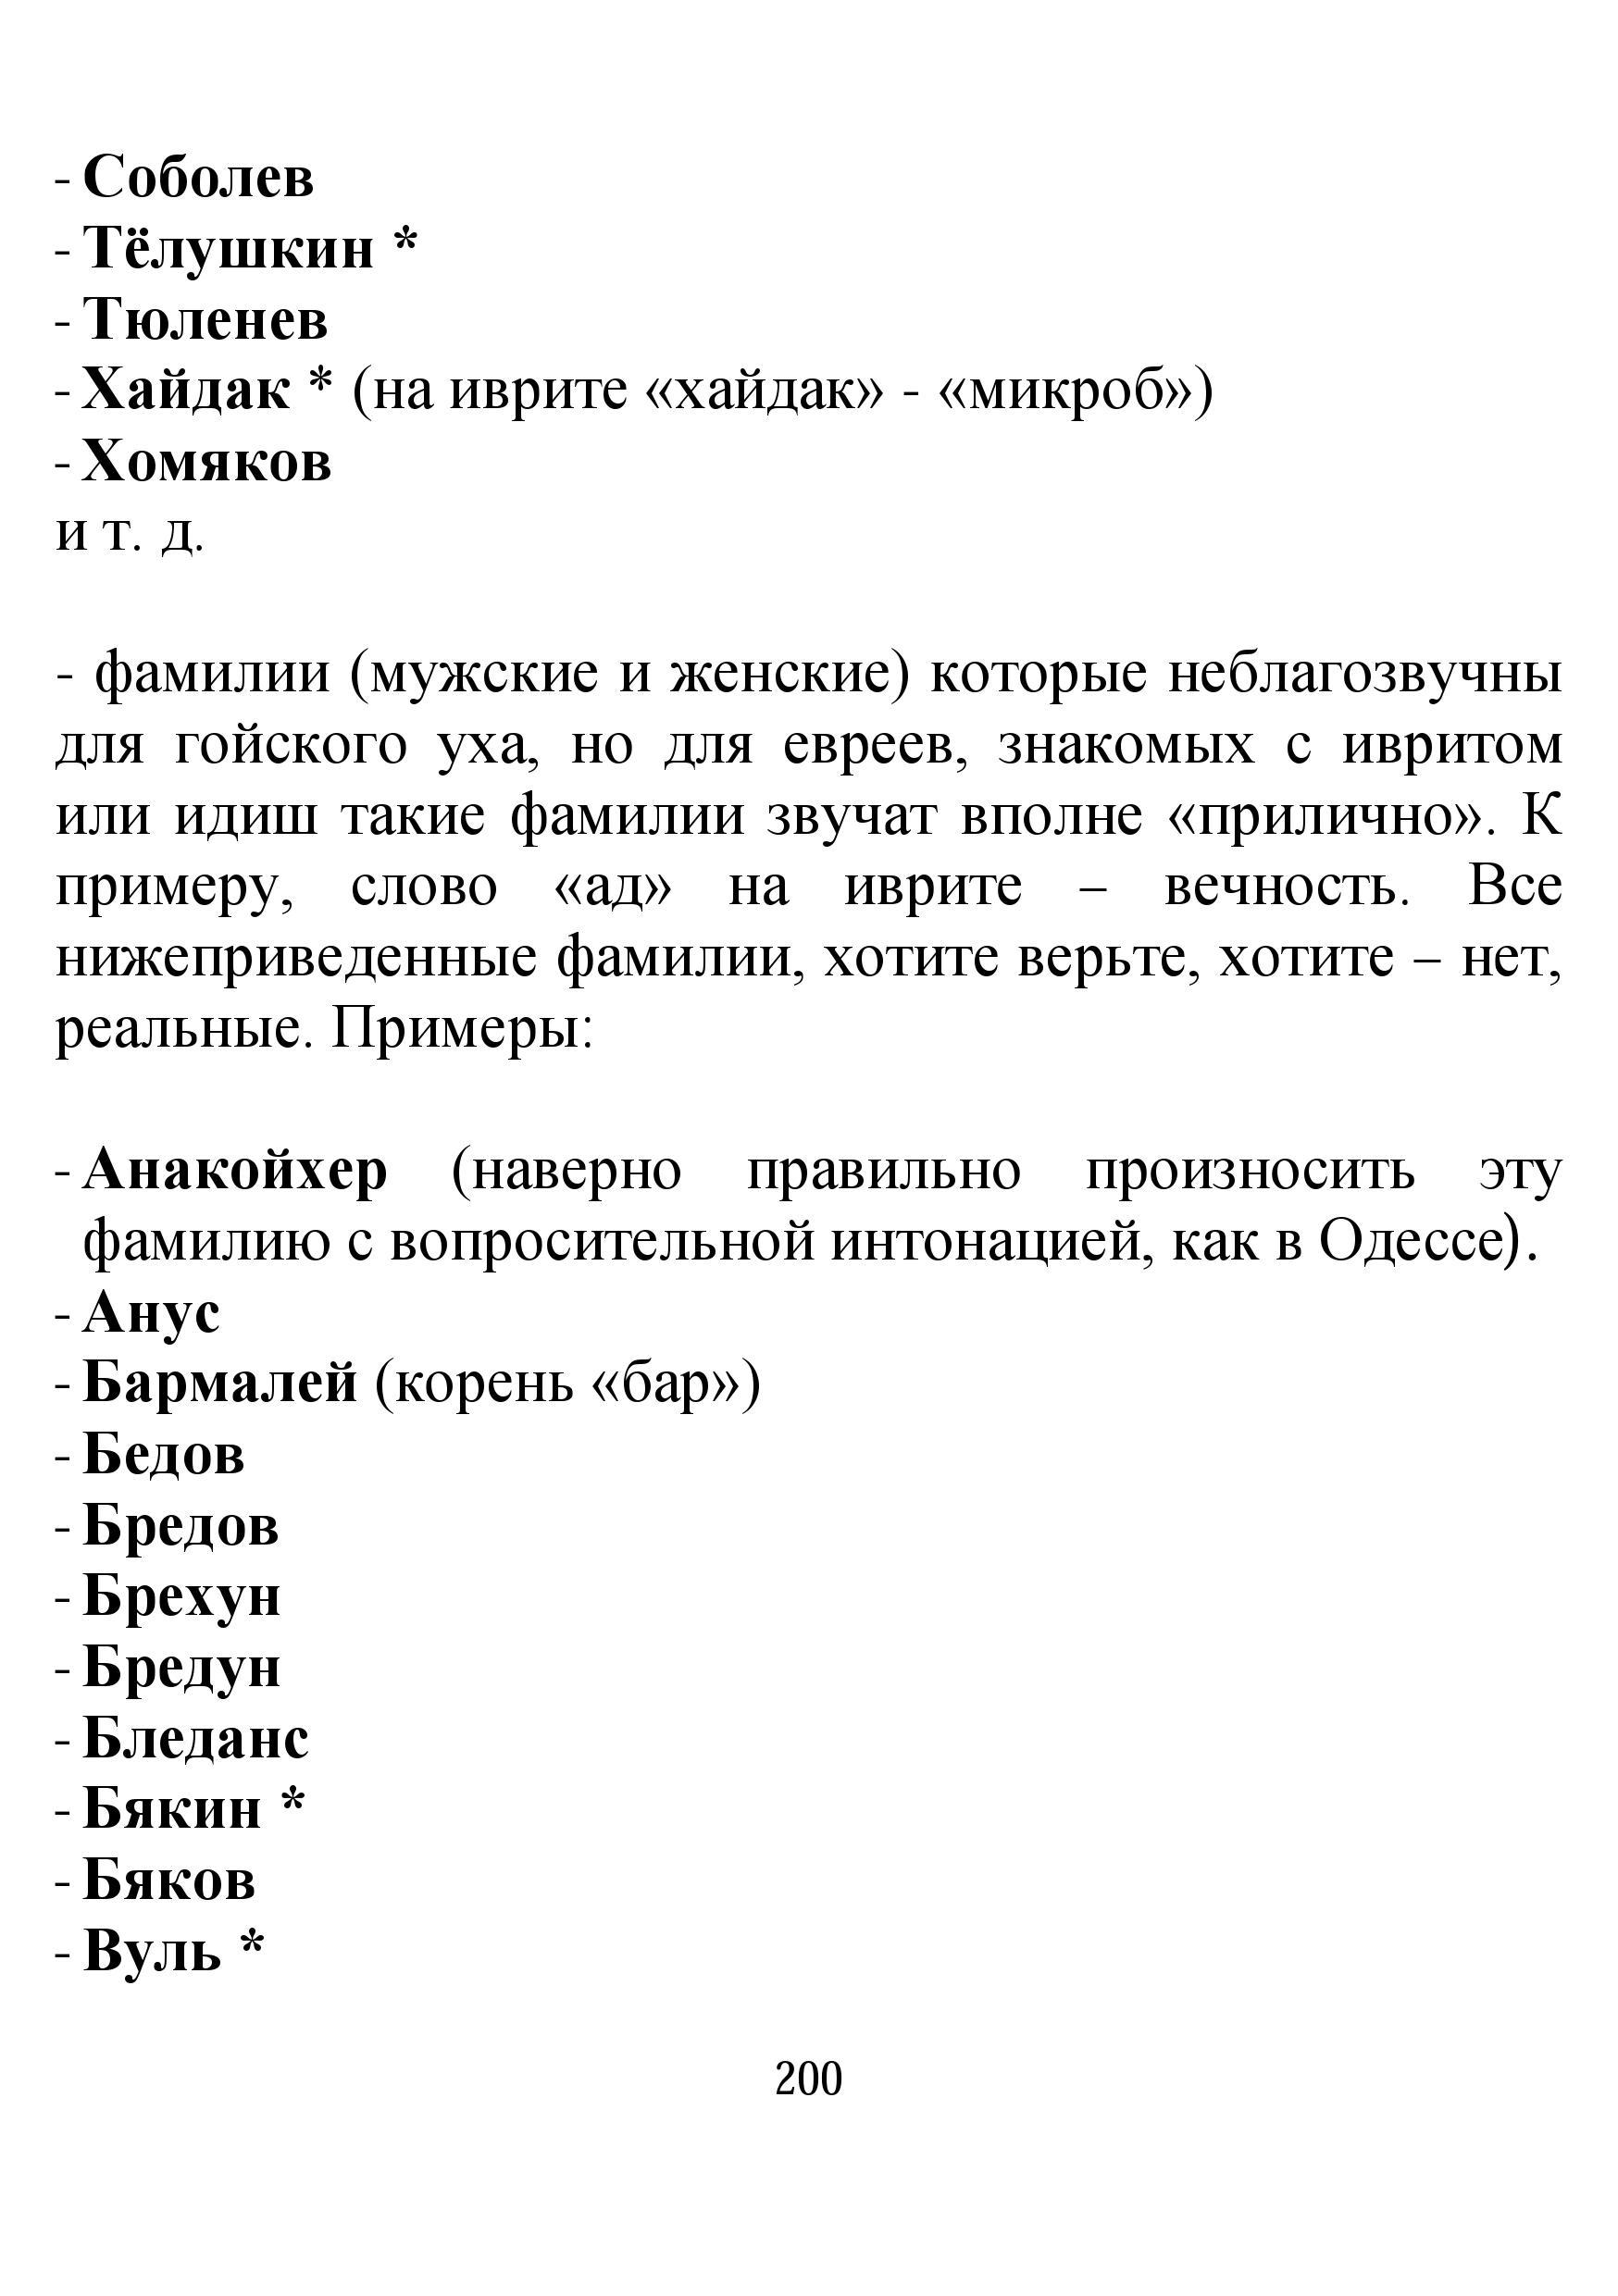 http://s2.uploads.ru/bOge8.jpg